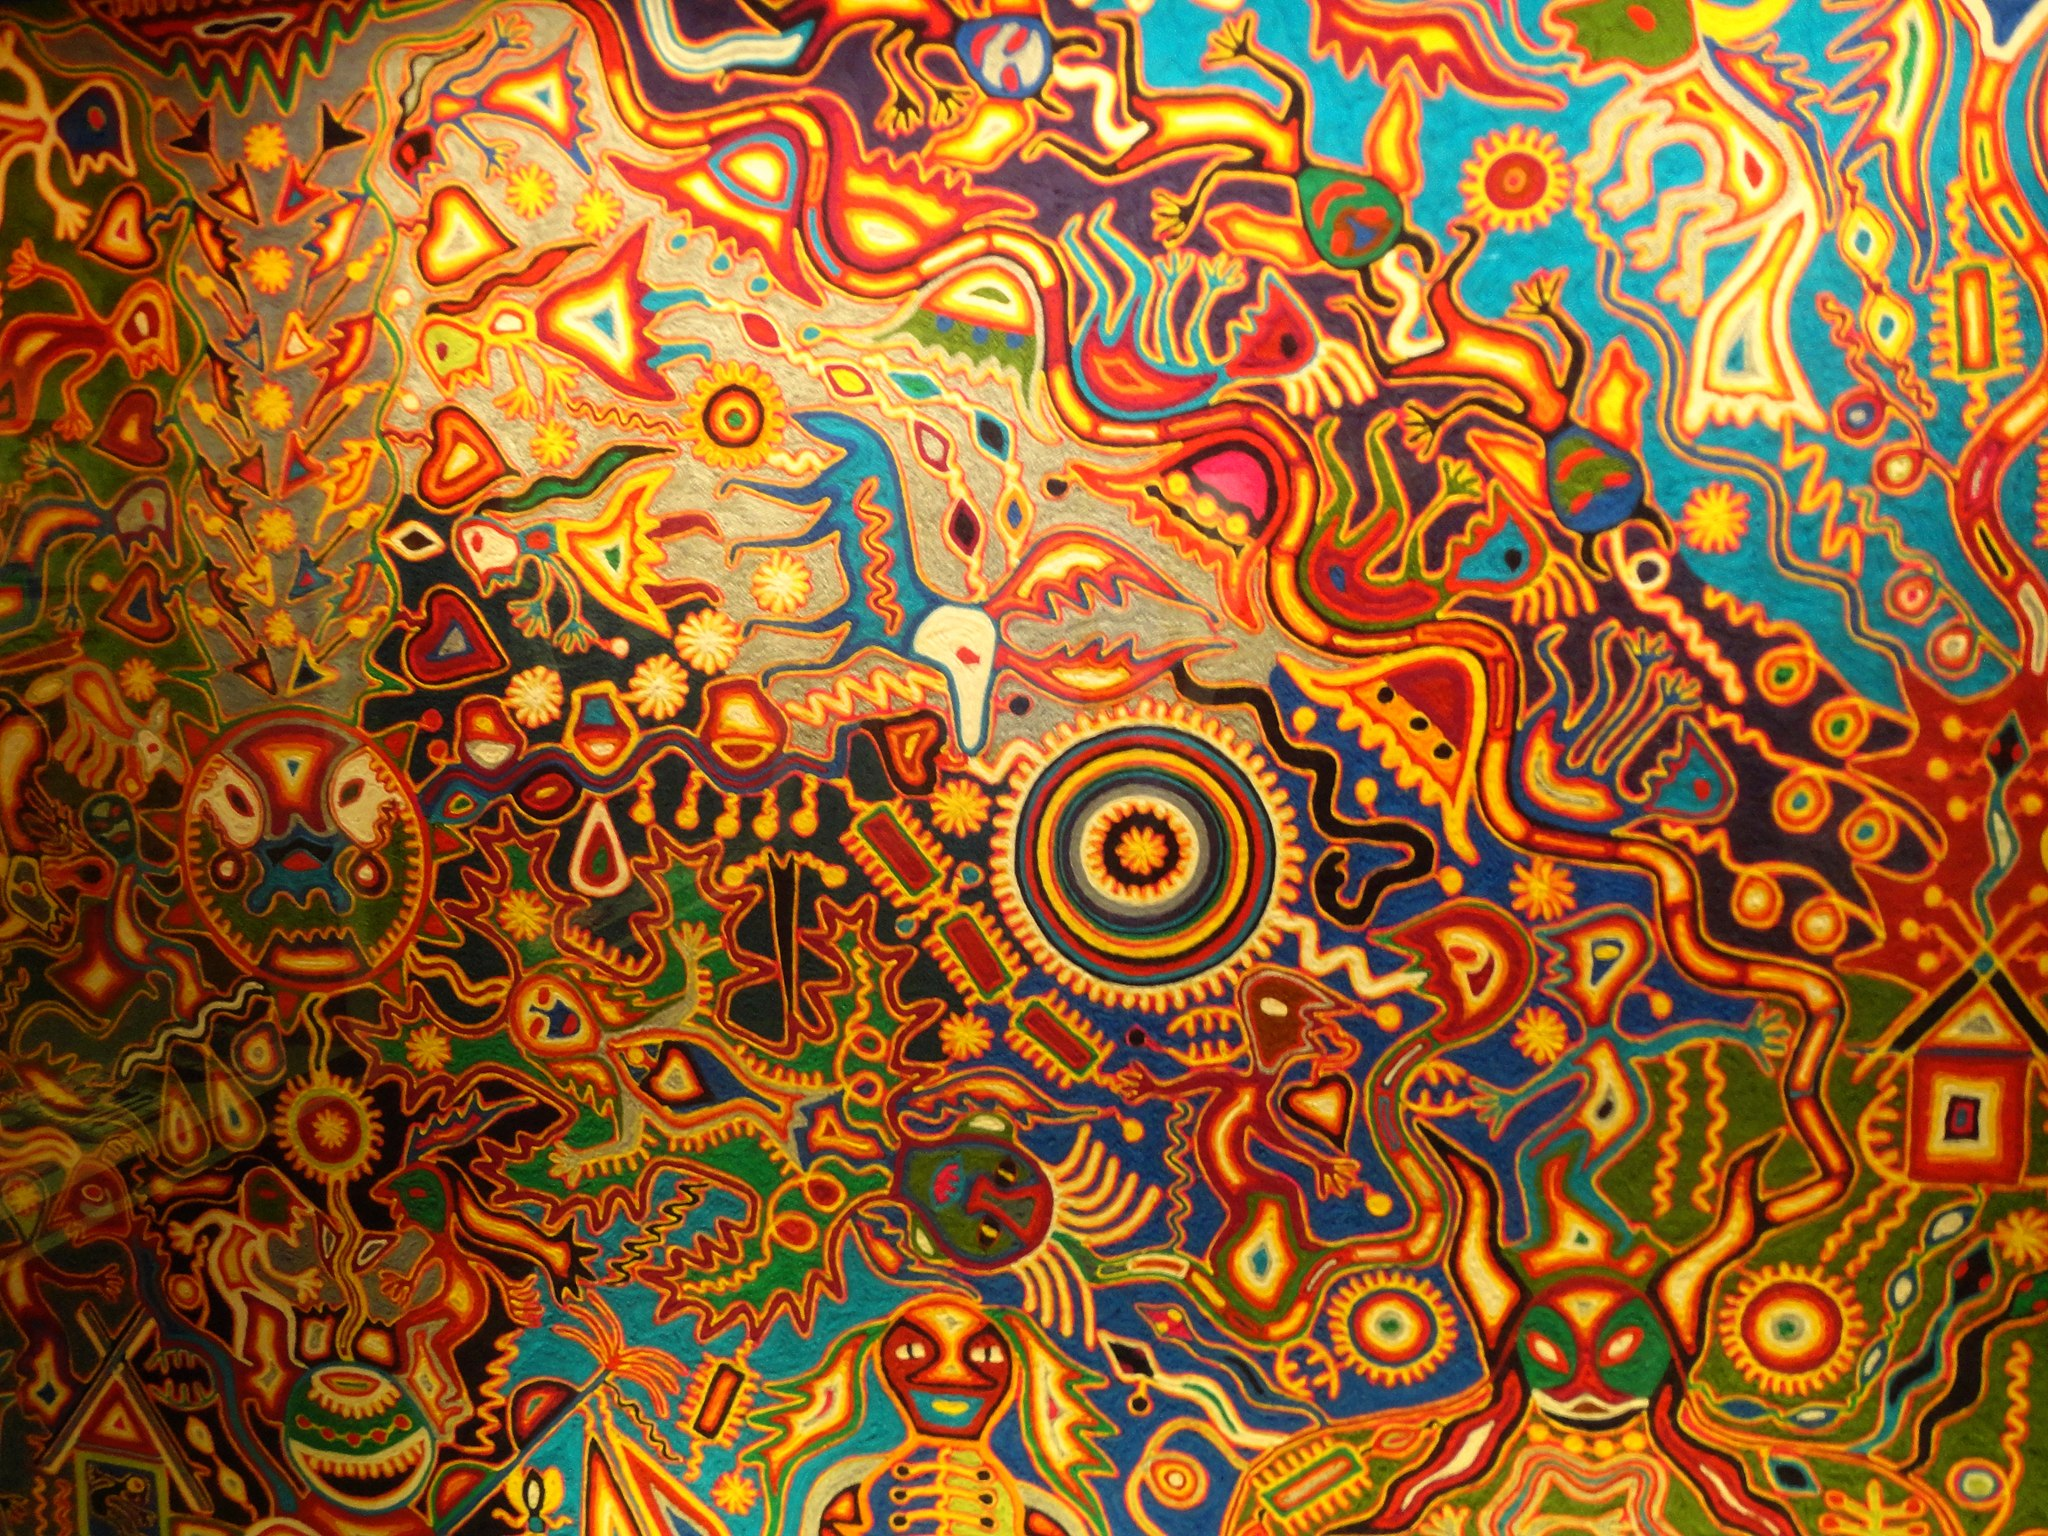 Mural Arte Huichol